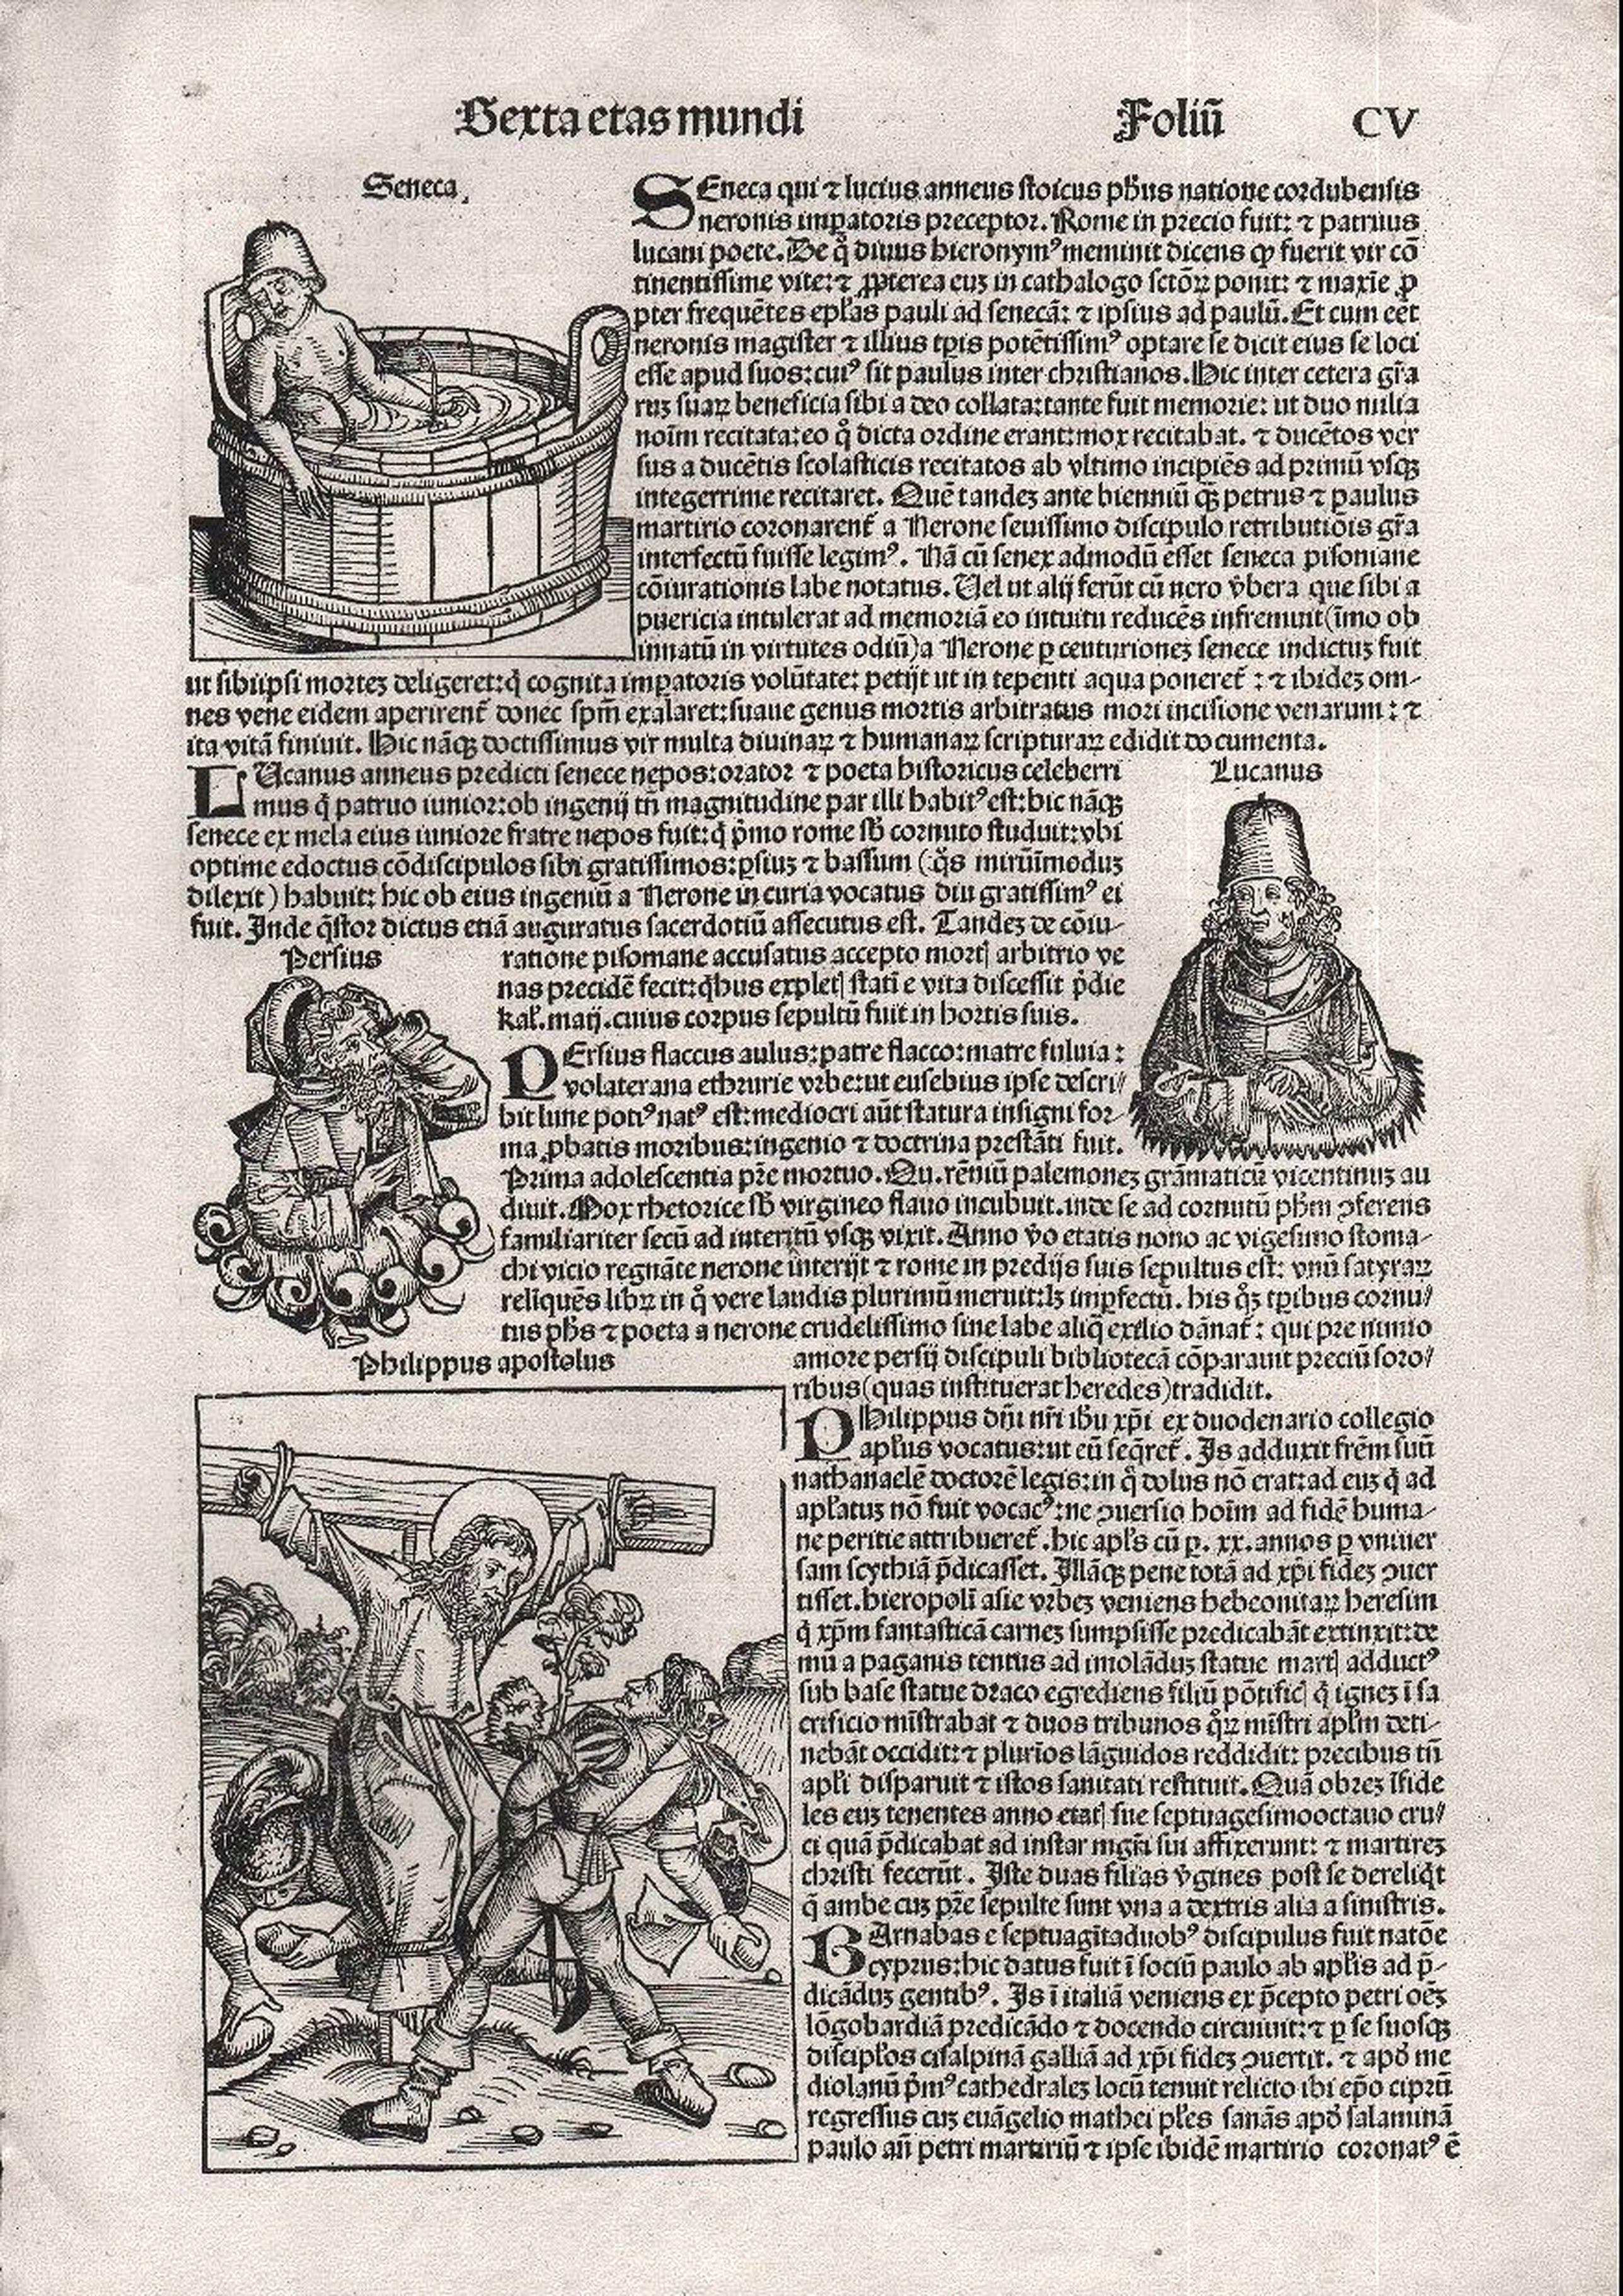 SCHEDEL, Hartmann. - Sexta Etas Mundi. Folio CV - Nuremberg Chronicle.